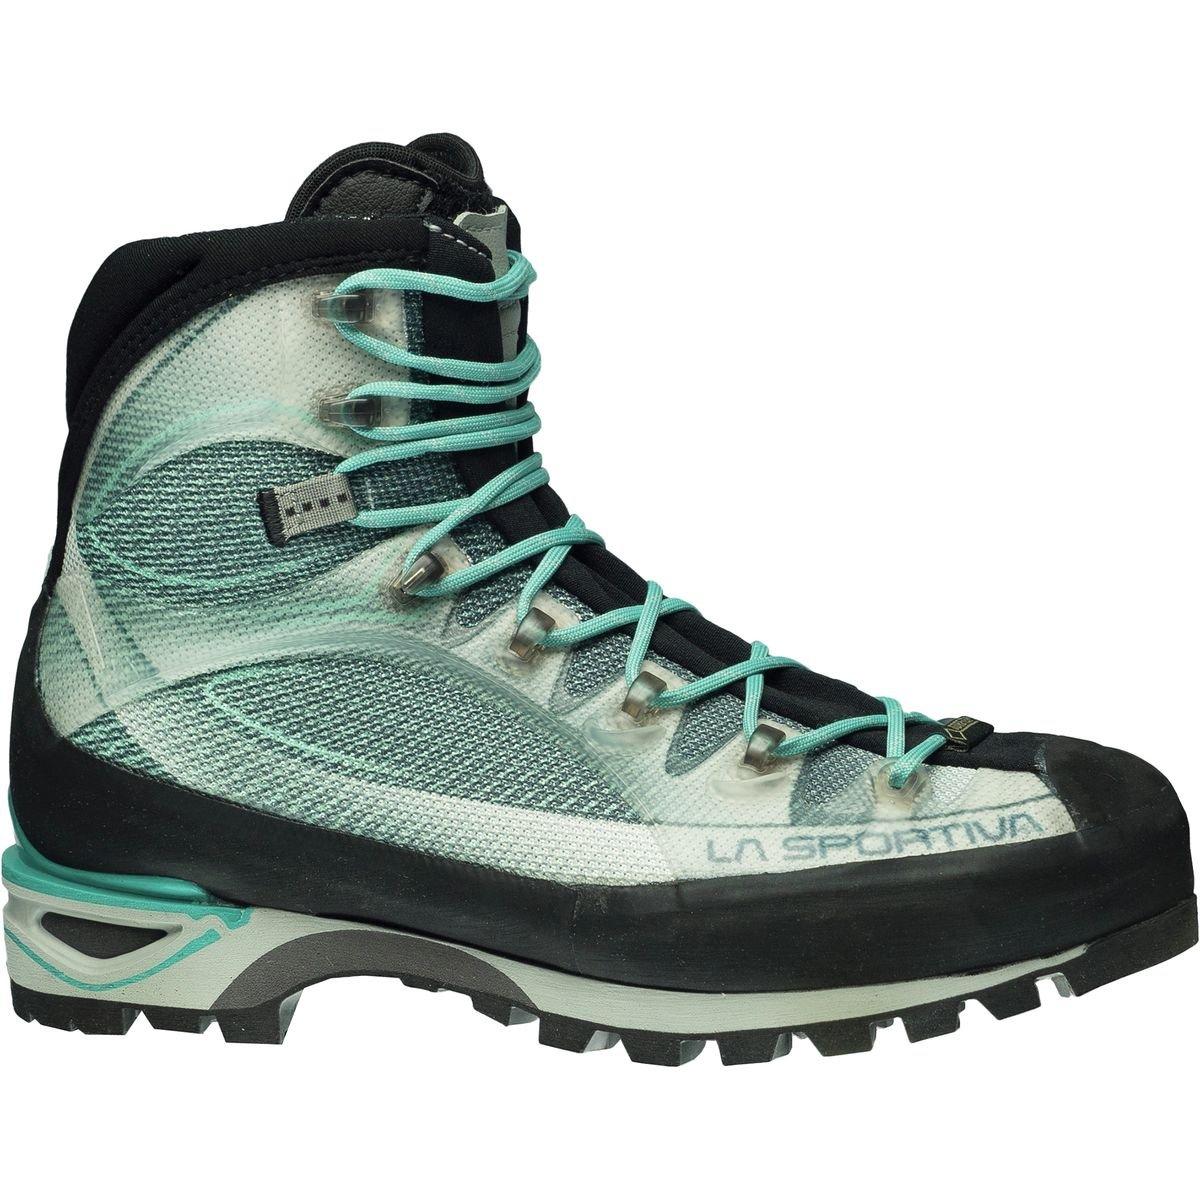 La Sportiva Trango Cube GTX Mountaineering Boot - Women's B01K5SIY3Q Medium / 41.5 M EU / 9.5 B(M) US|Light Grey/Mint